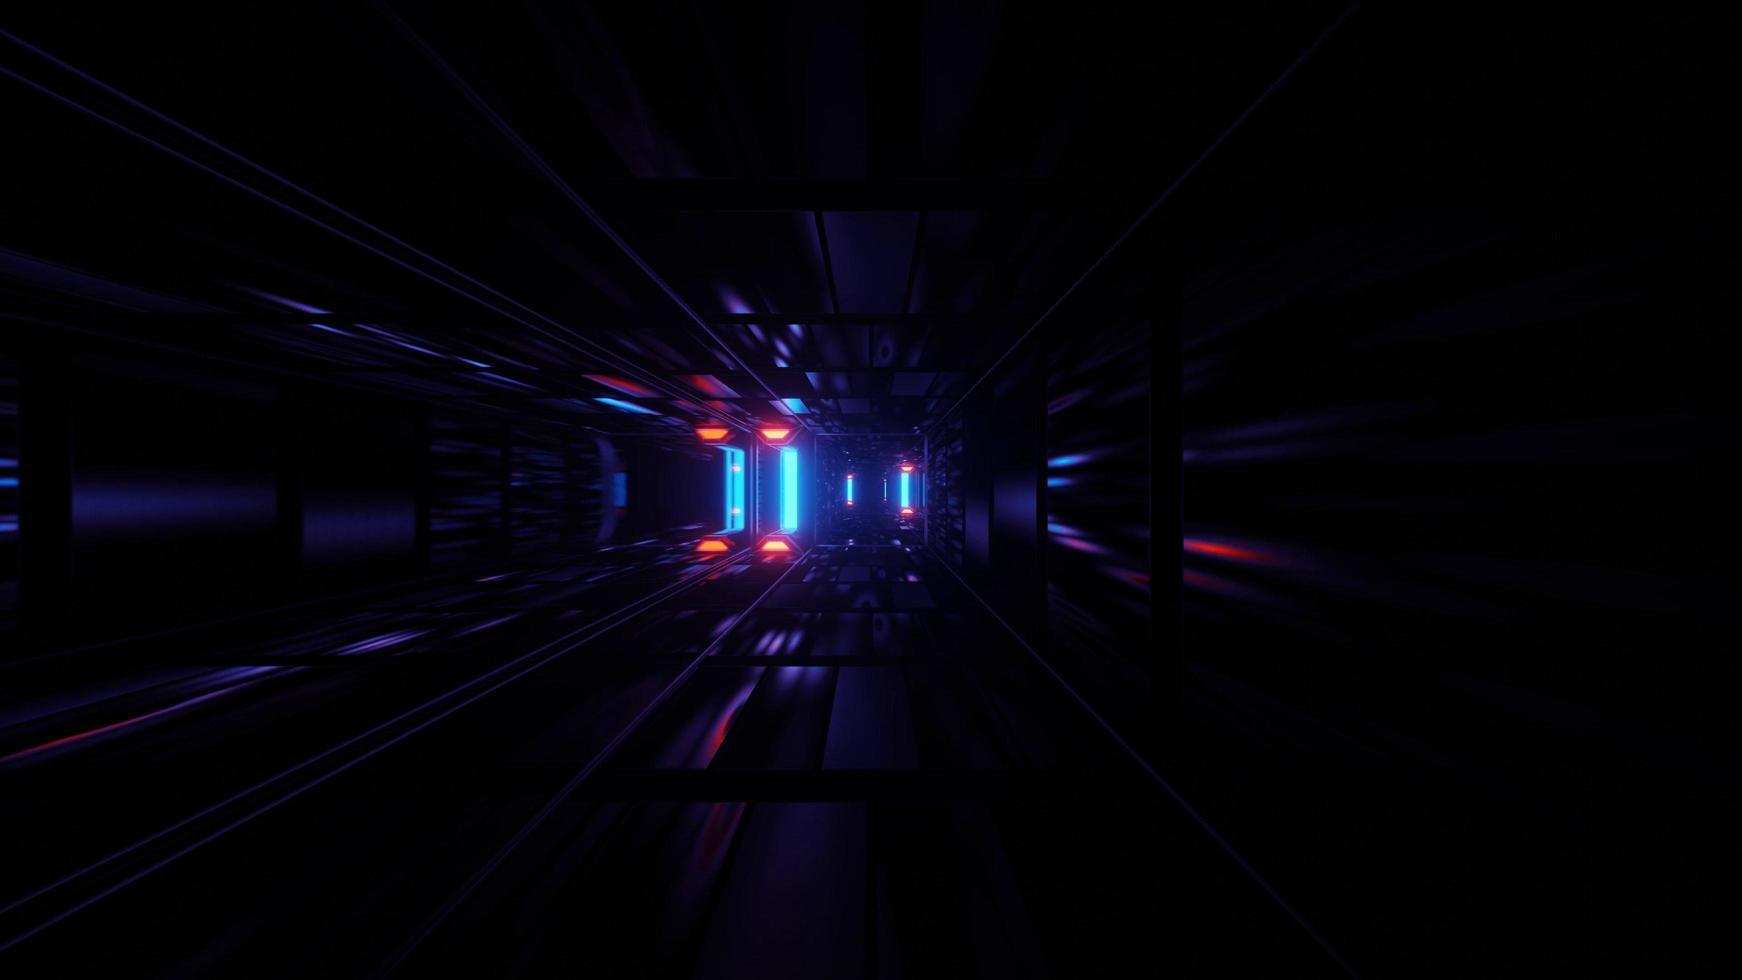 Alternating neon light 3D illustration background photo